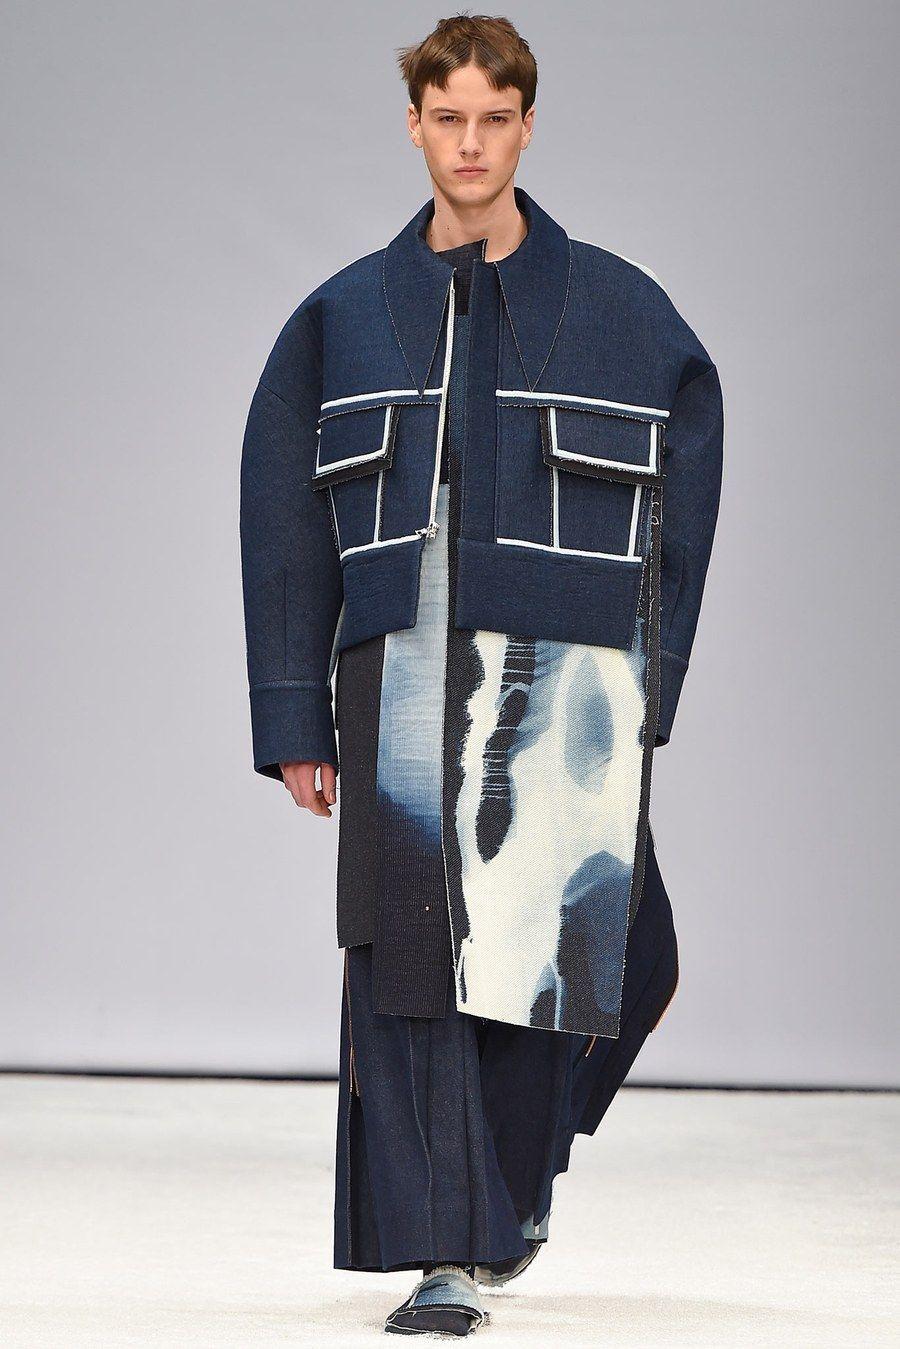 H&M Design Award Stockholm Fall 2015 Fashion Show